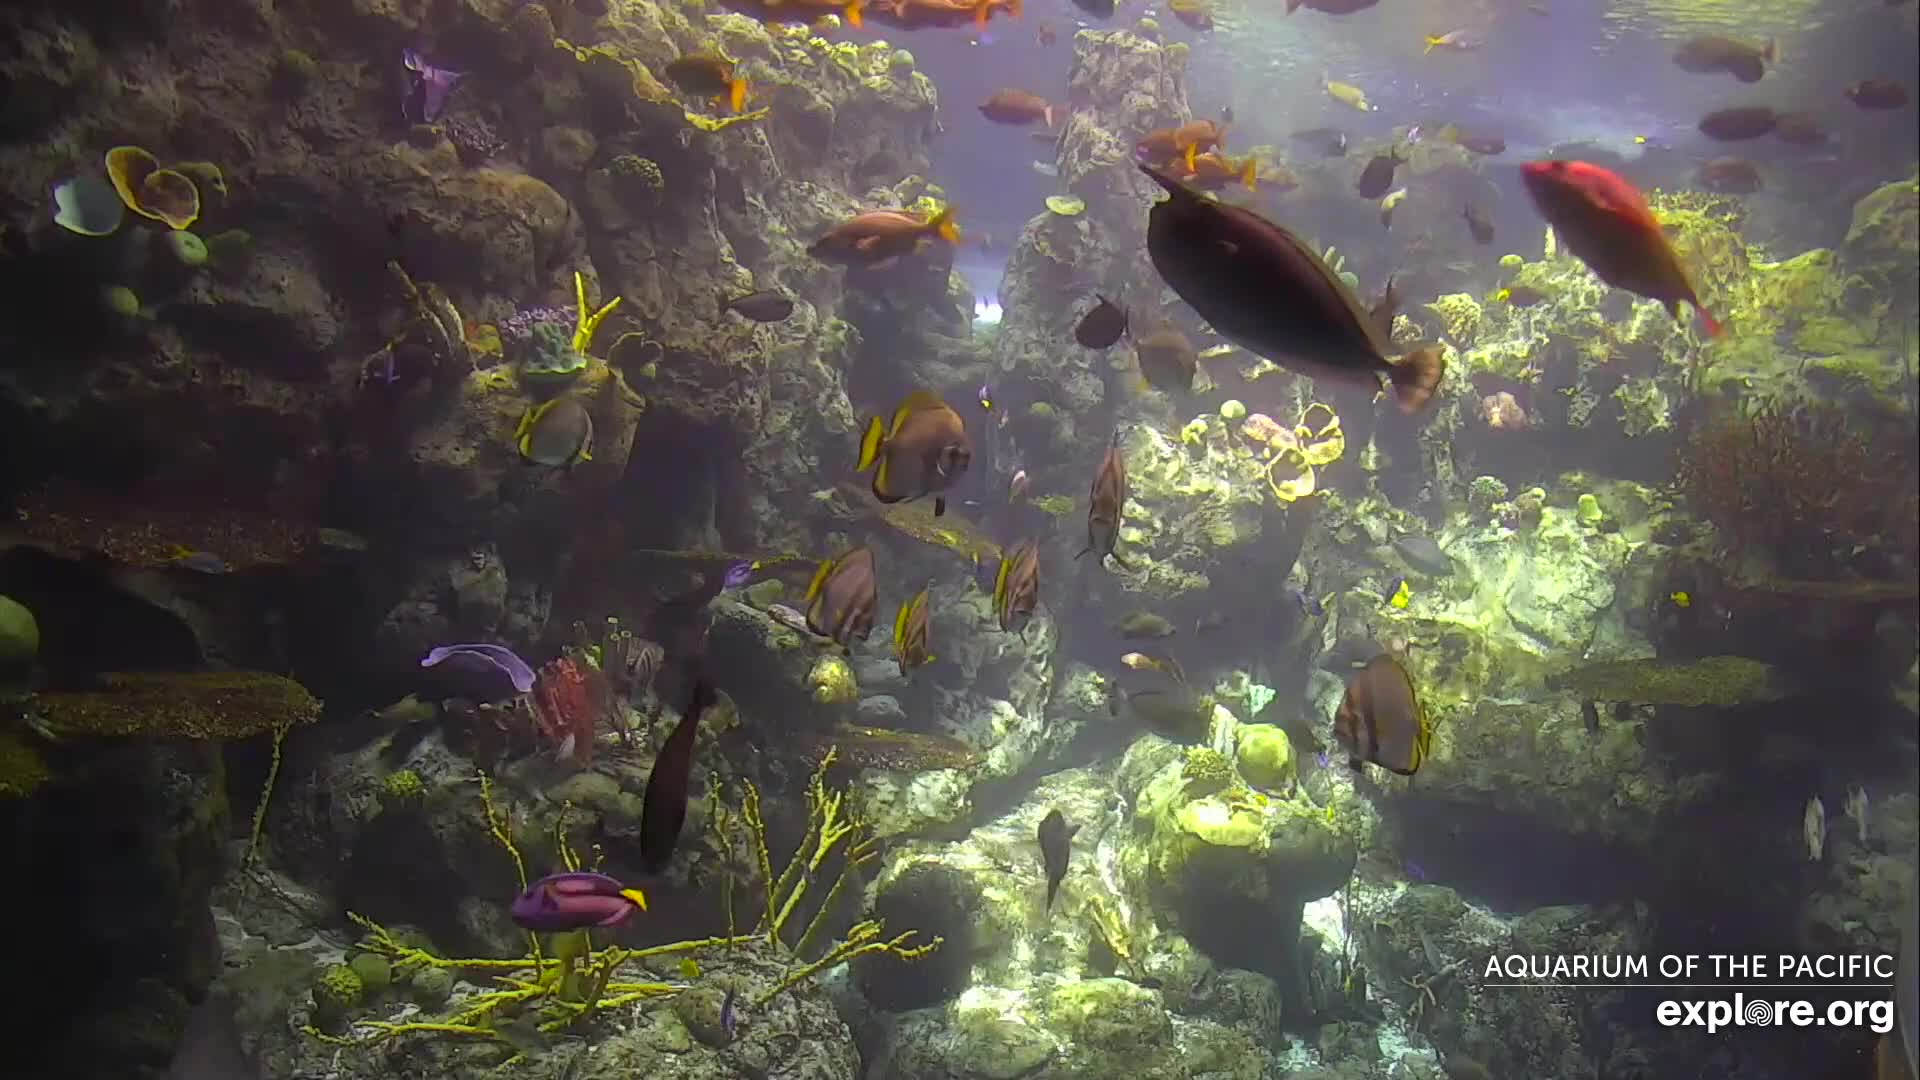 Long Beach, California Underwater Live Cam